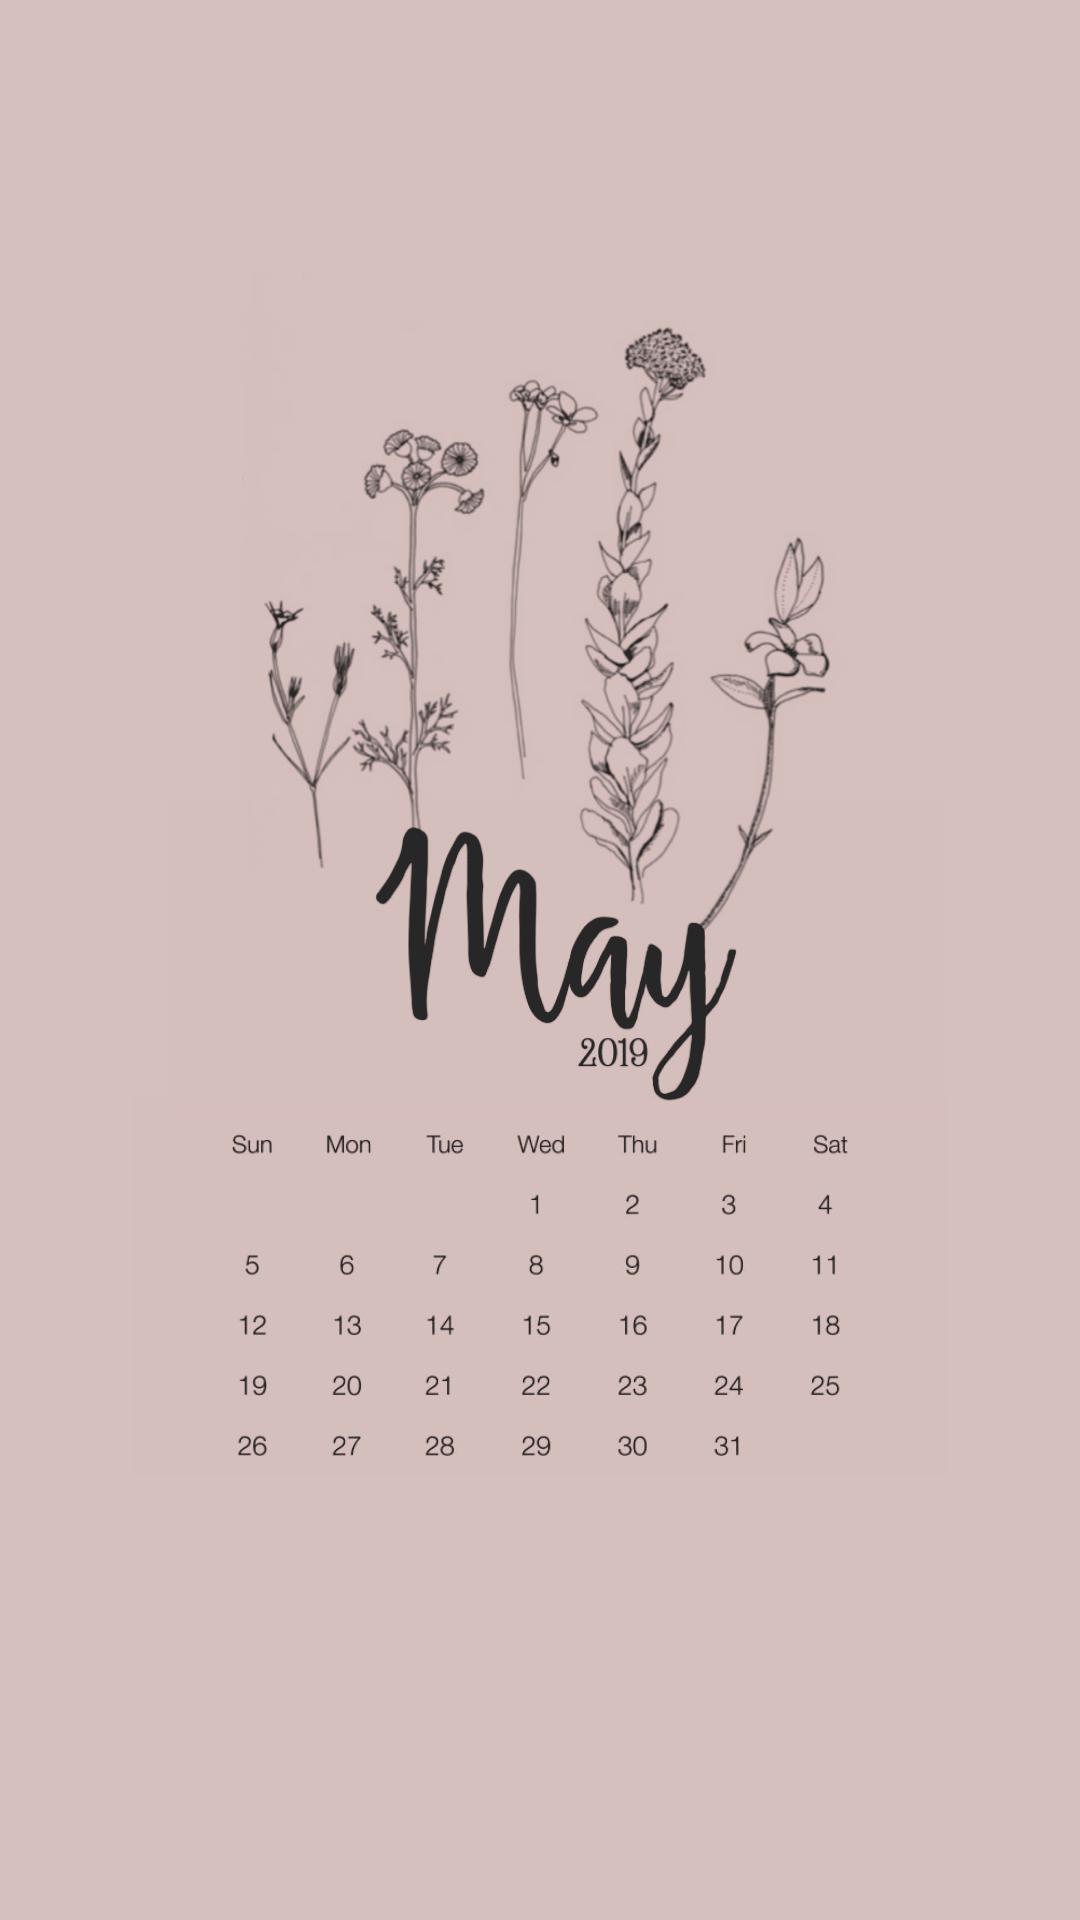 May 2020 Desktop Calendar Wallpaper In 2020 Calendar Wallpaper